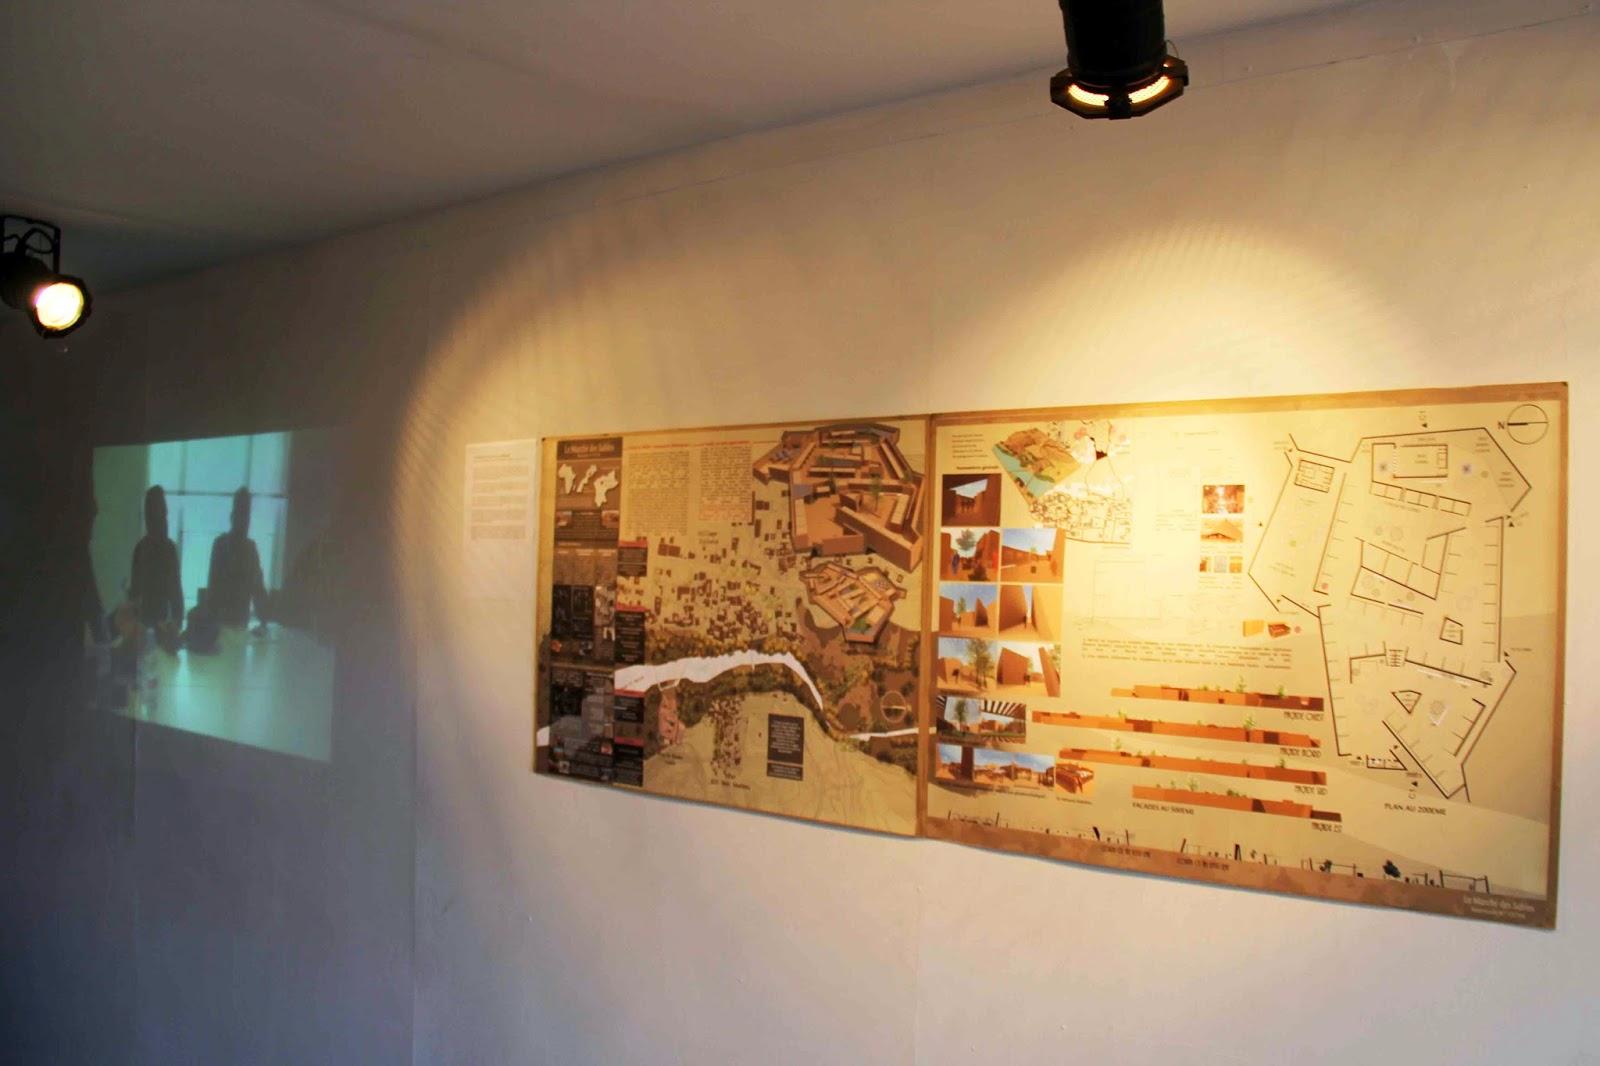 D Exhibition : Ethiopia archigineer africa exhibition in photos